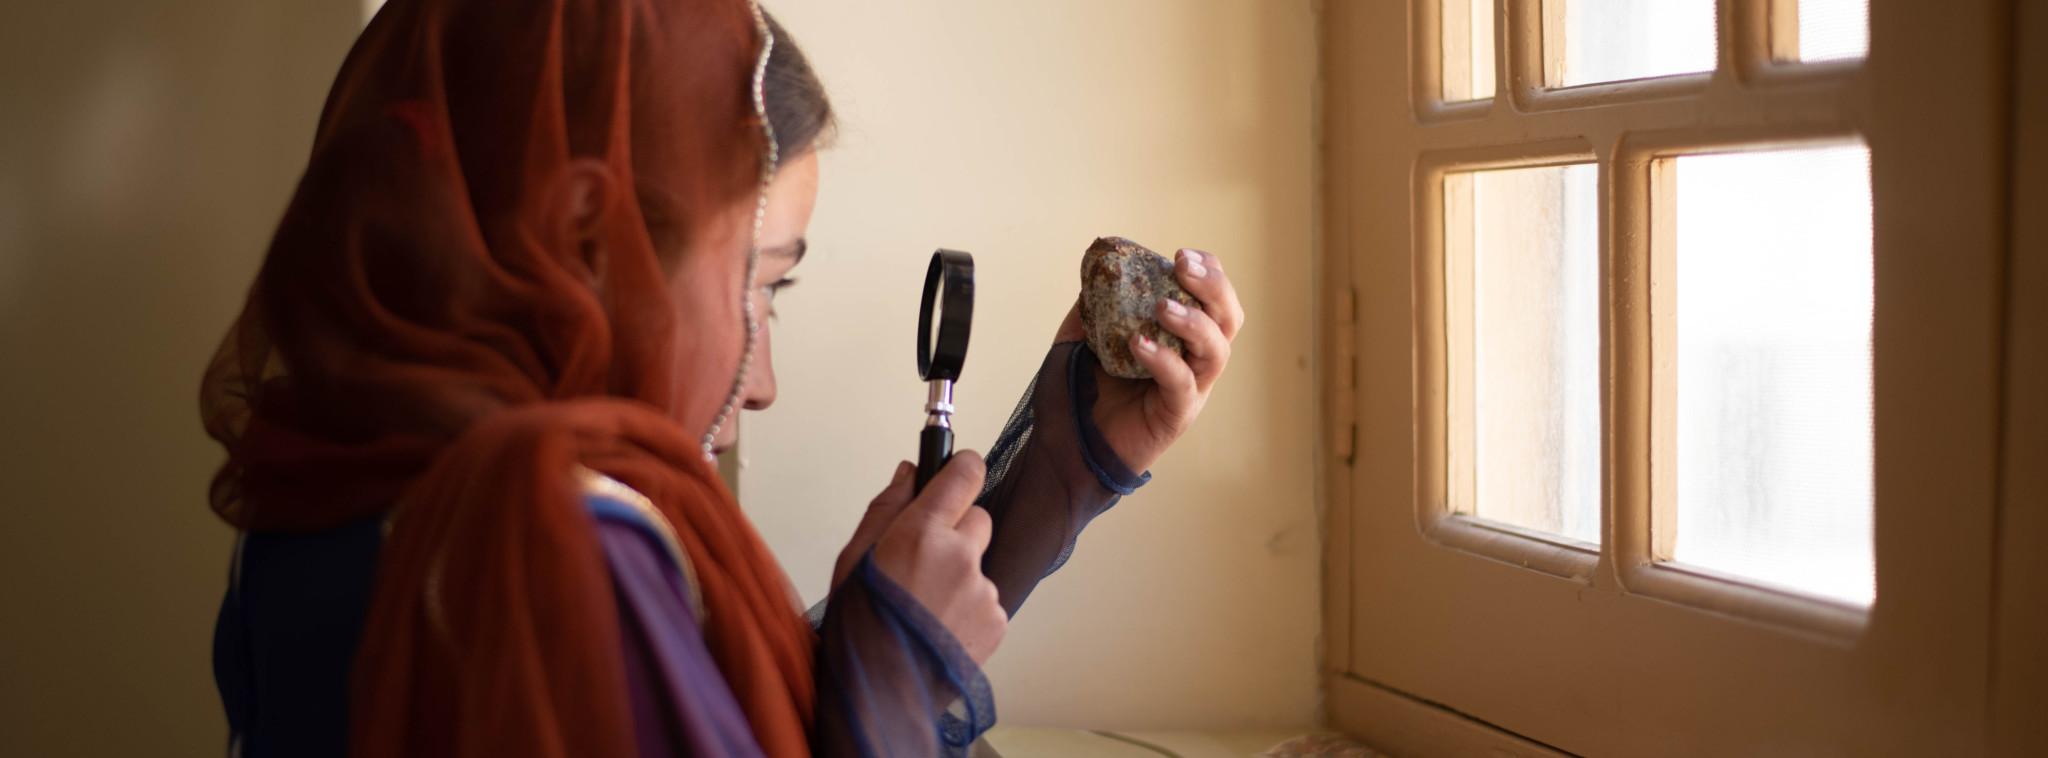 Girl in Pakistan